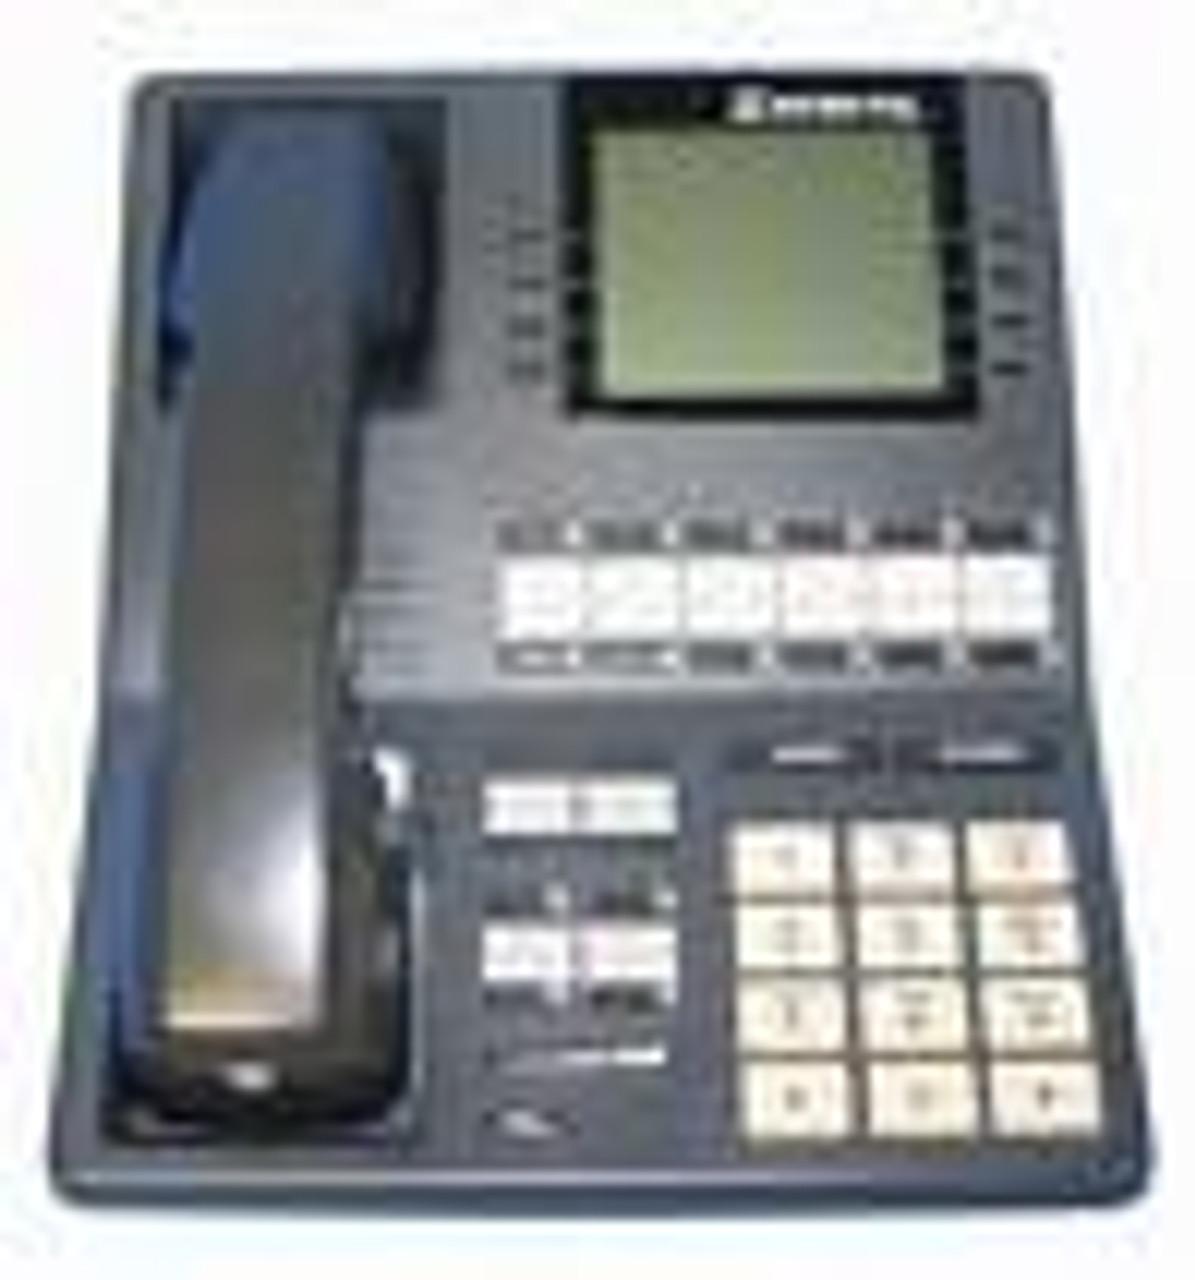 Fully Refurbished Intertel Axxess 550.4500 Large Display Speaker Phone